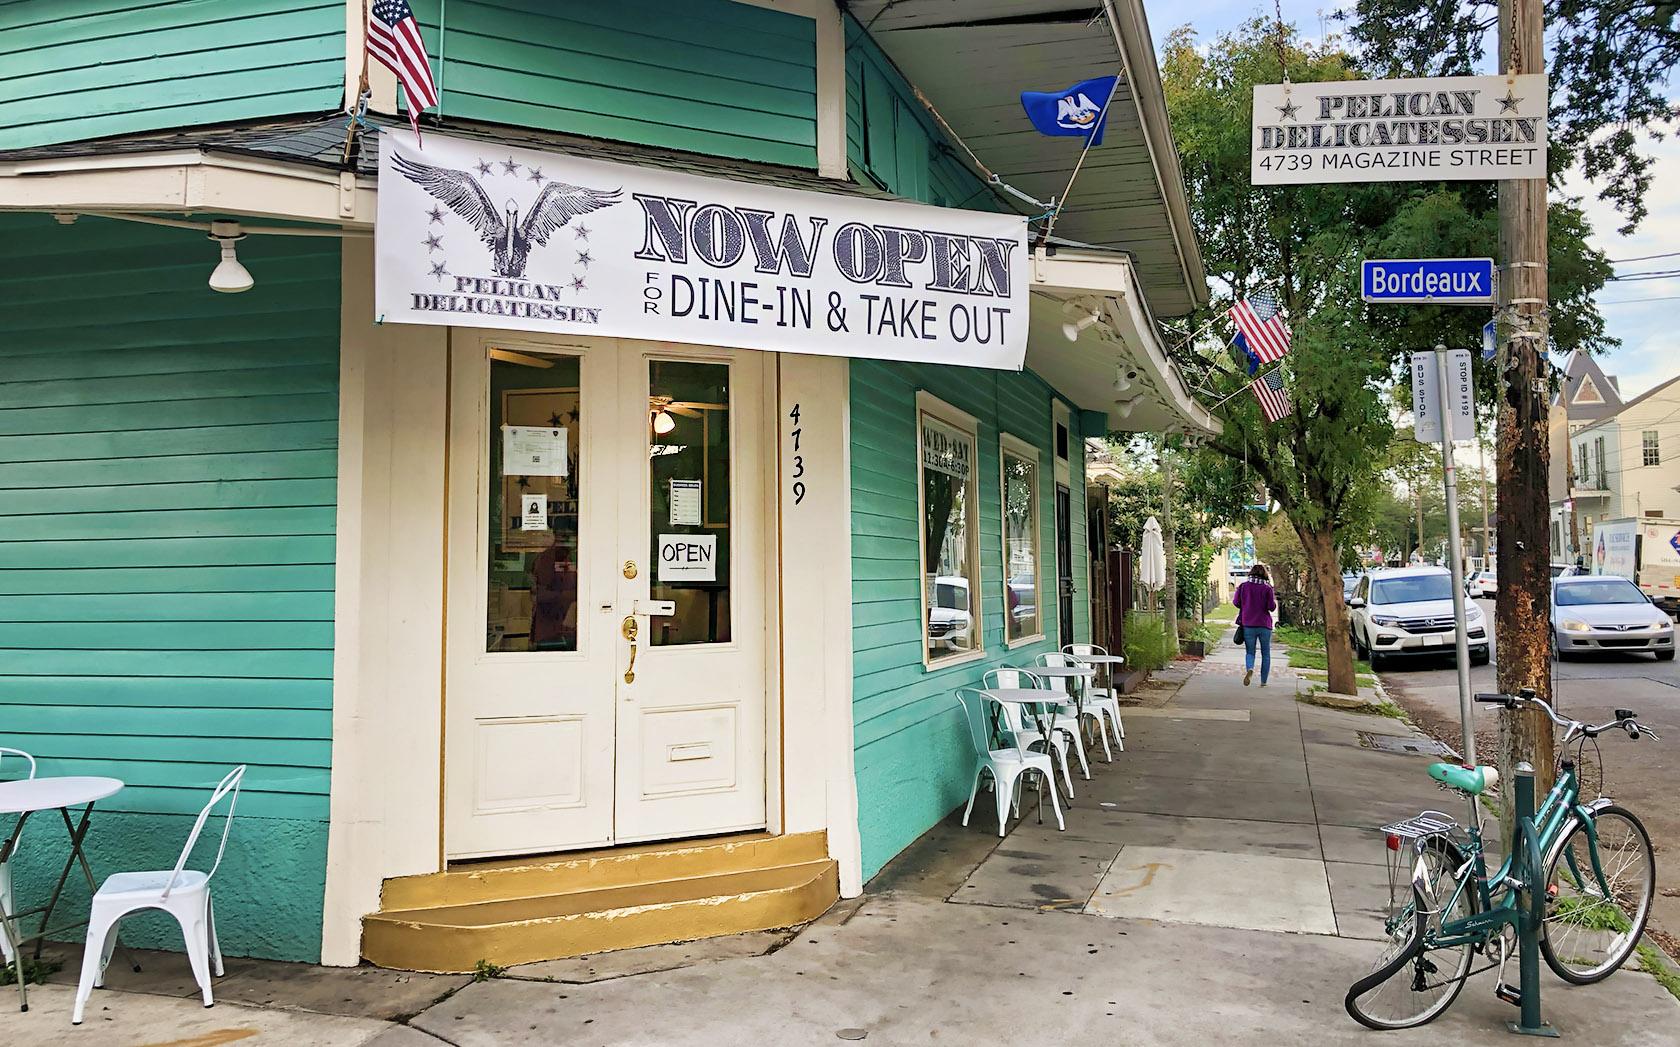 pelican delicatessen restaurant - uptown - nola places photo